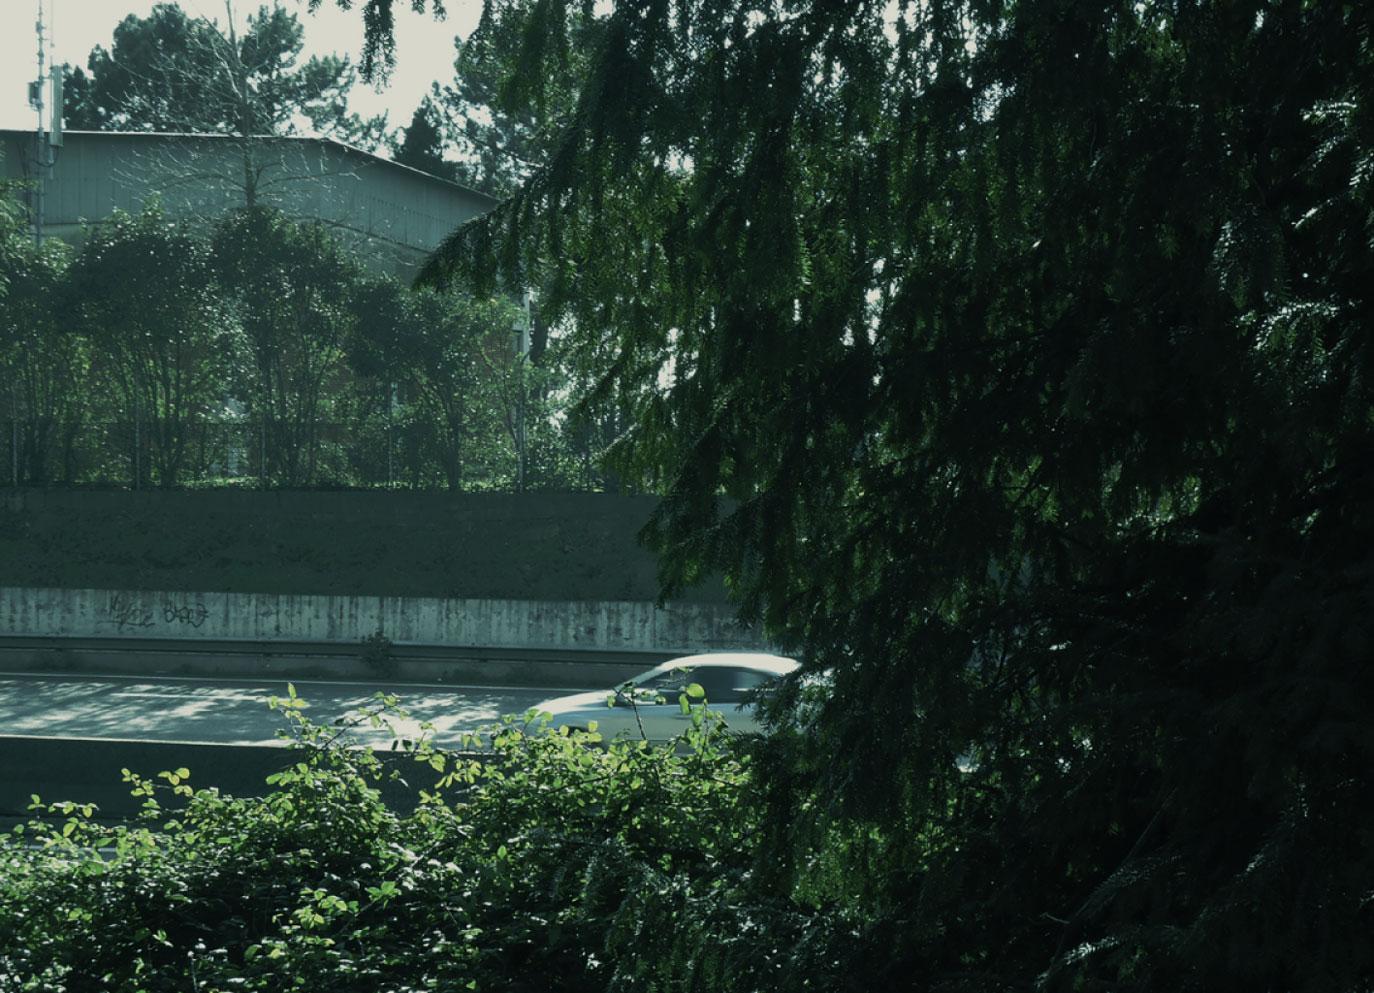 selva-urbana-14.jpg